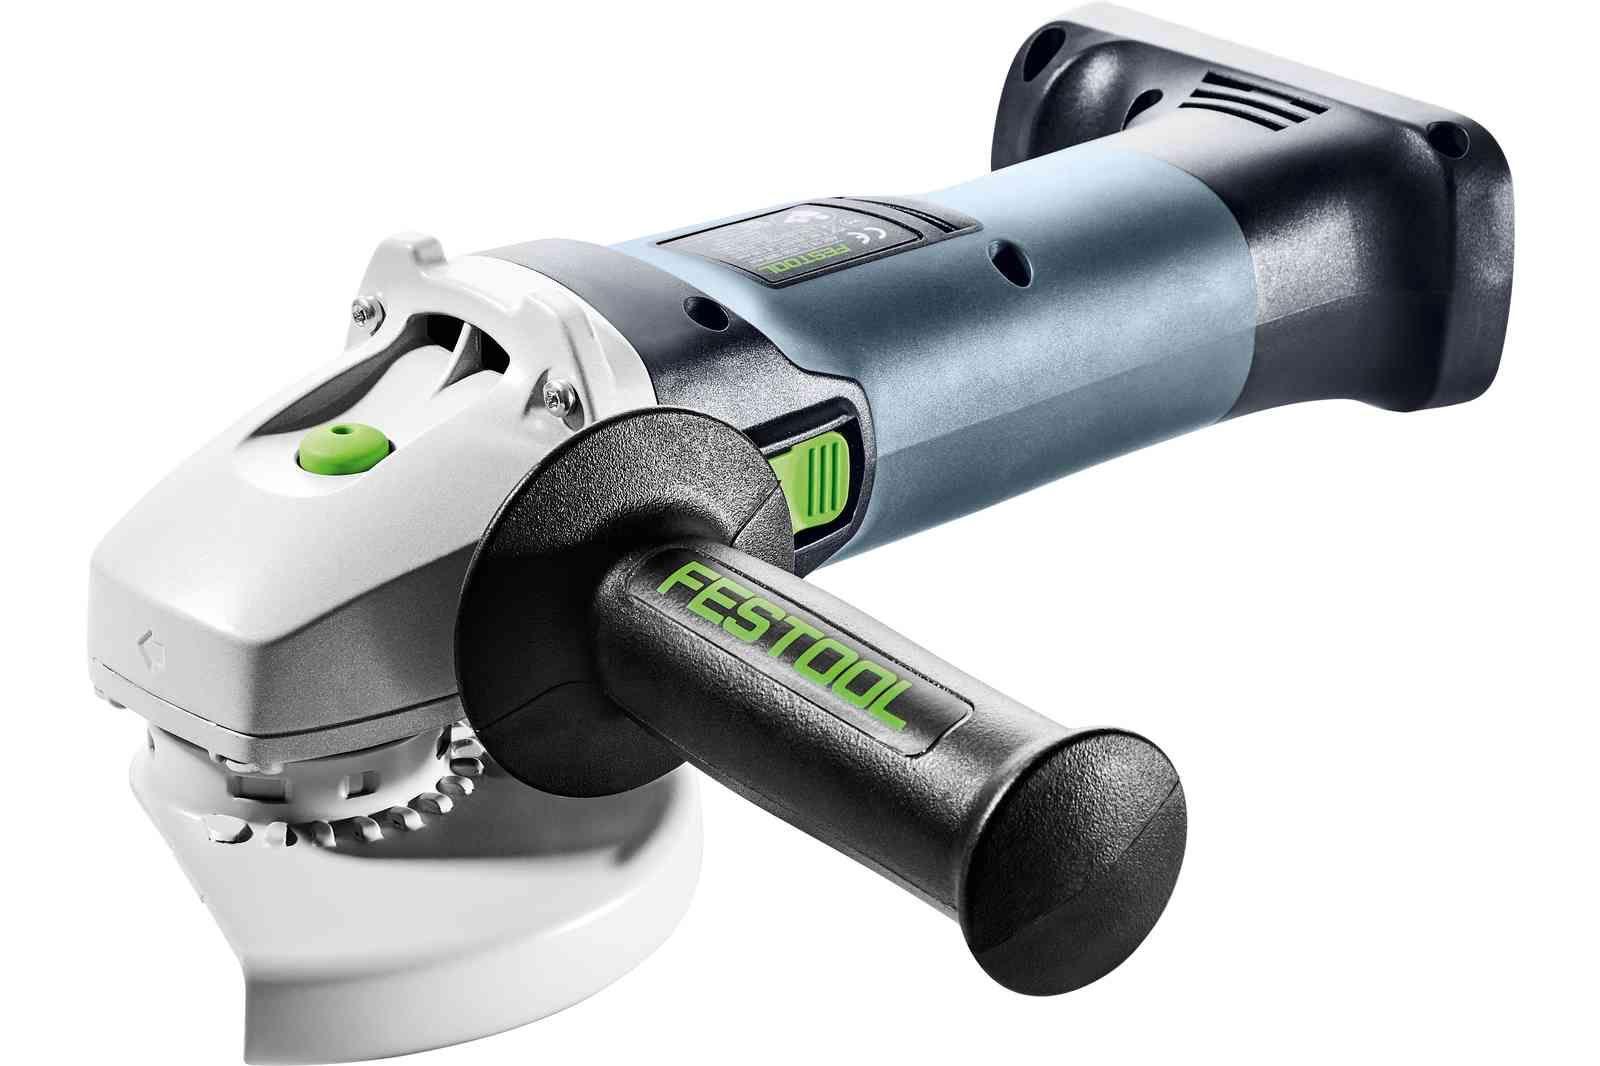 Festool AGC 18 cordless angle grinder: Compact, tough